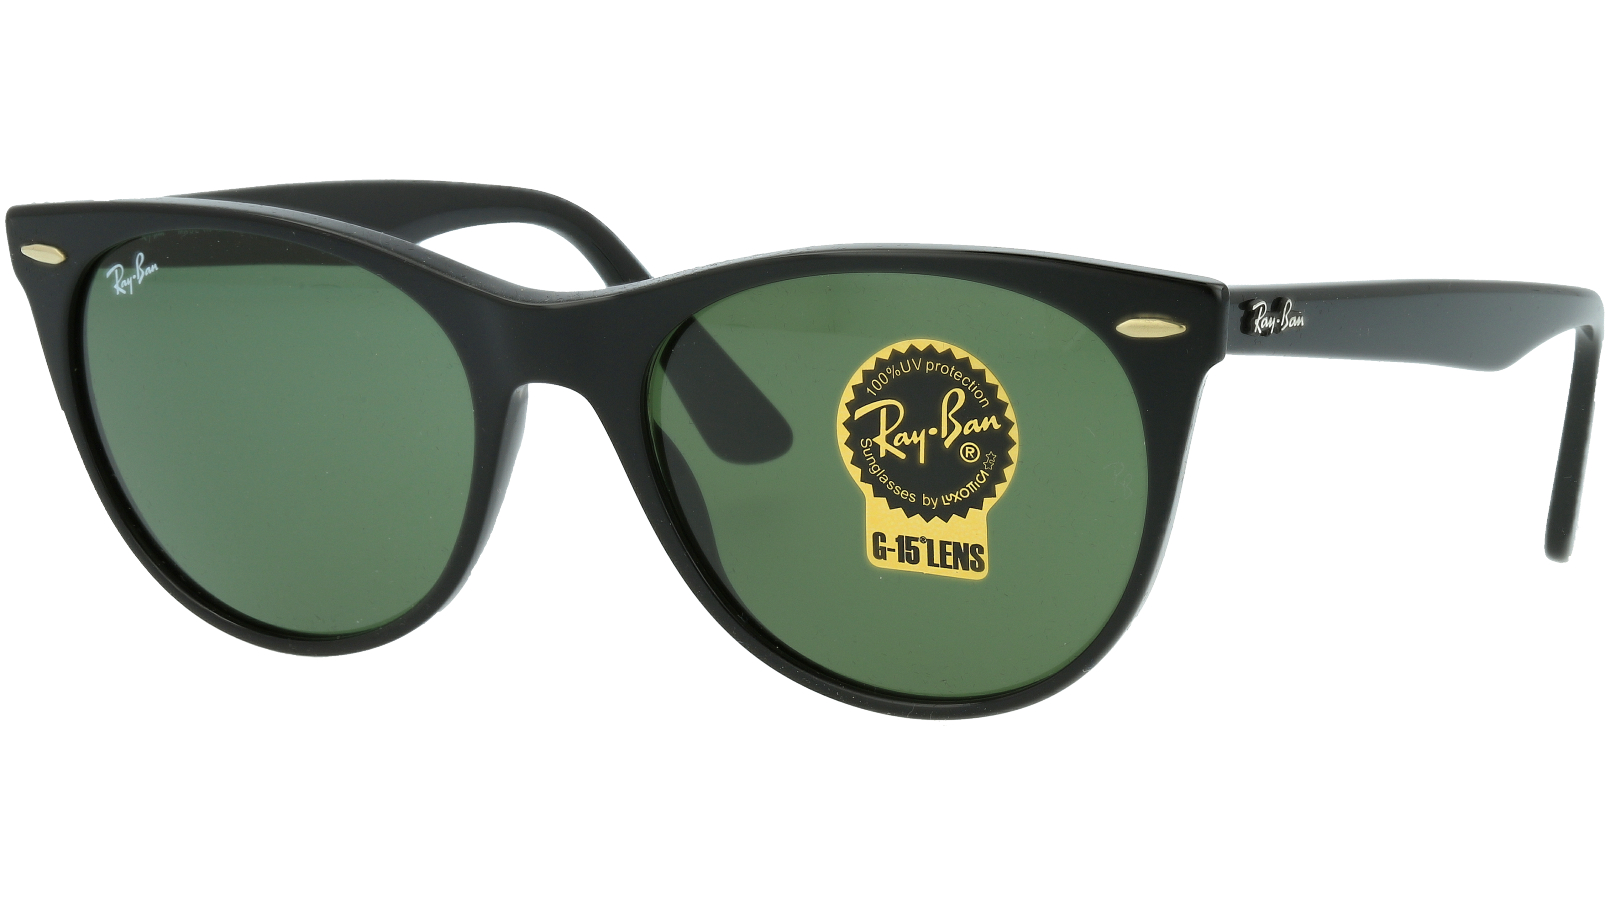 Ray-Ban RB2185 901/31 55 BLACK Sunglasses